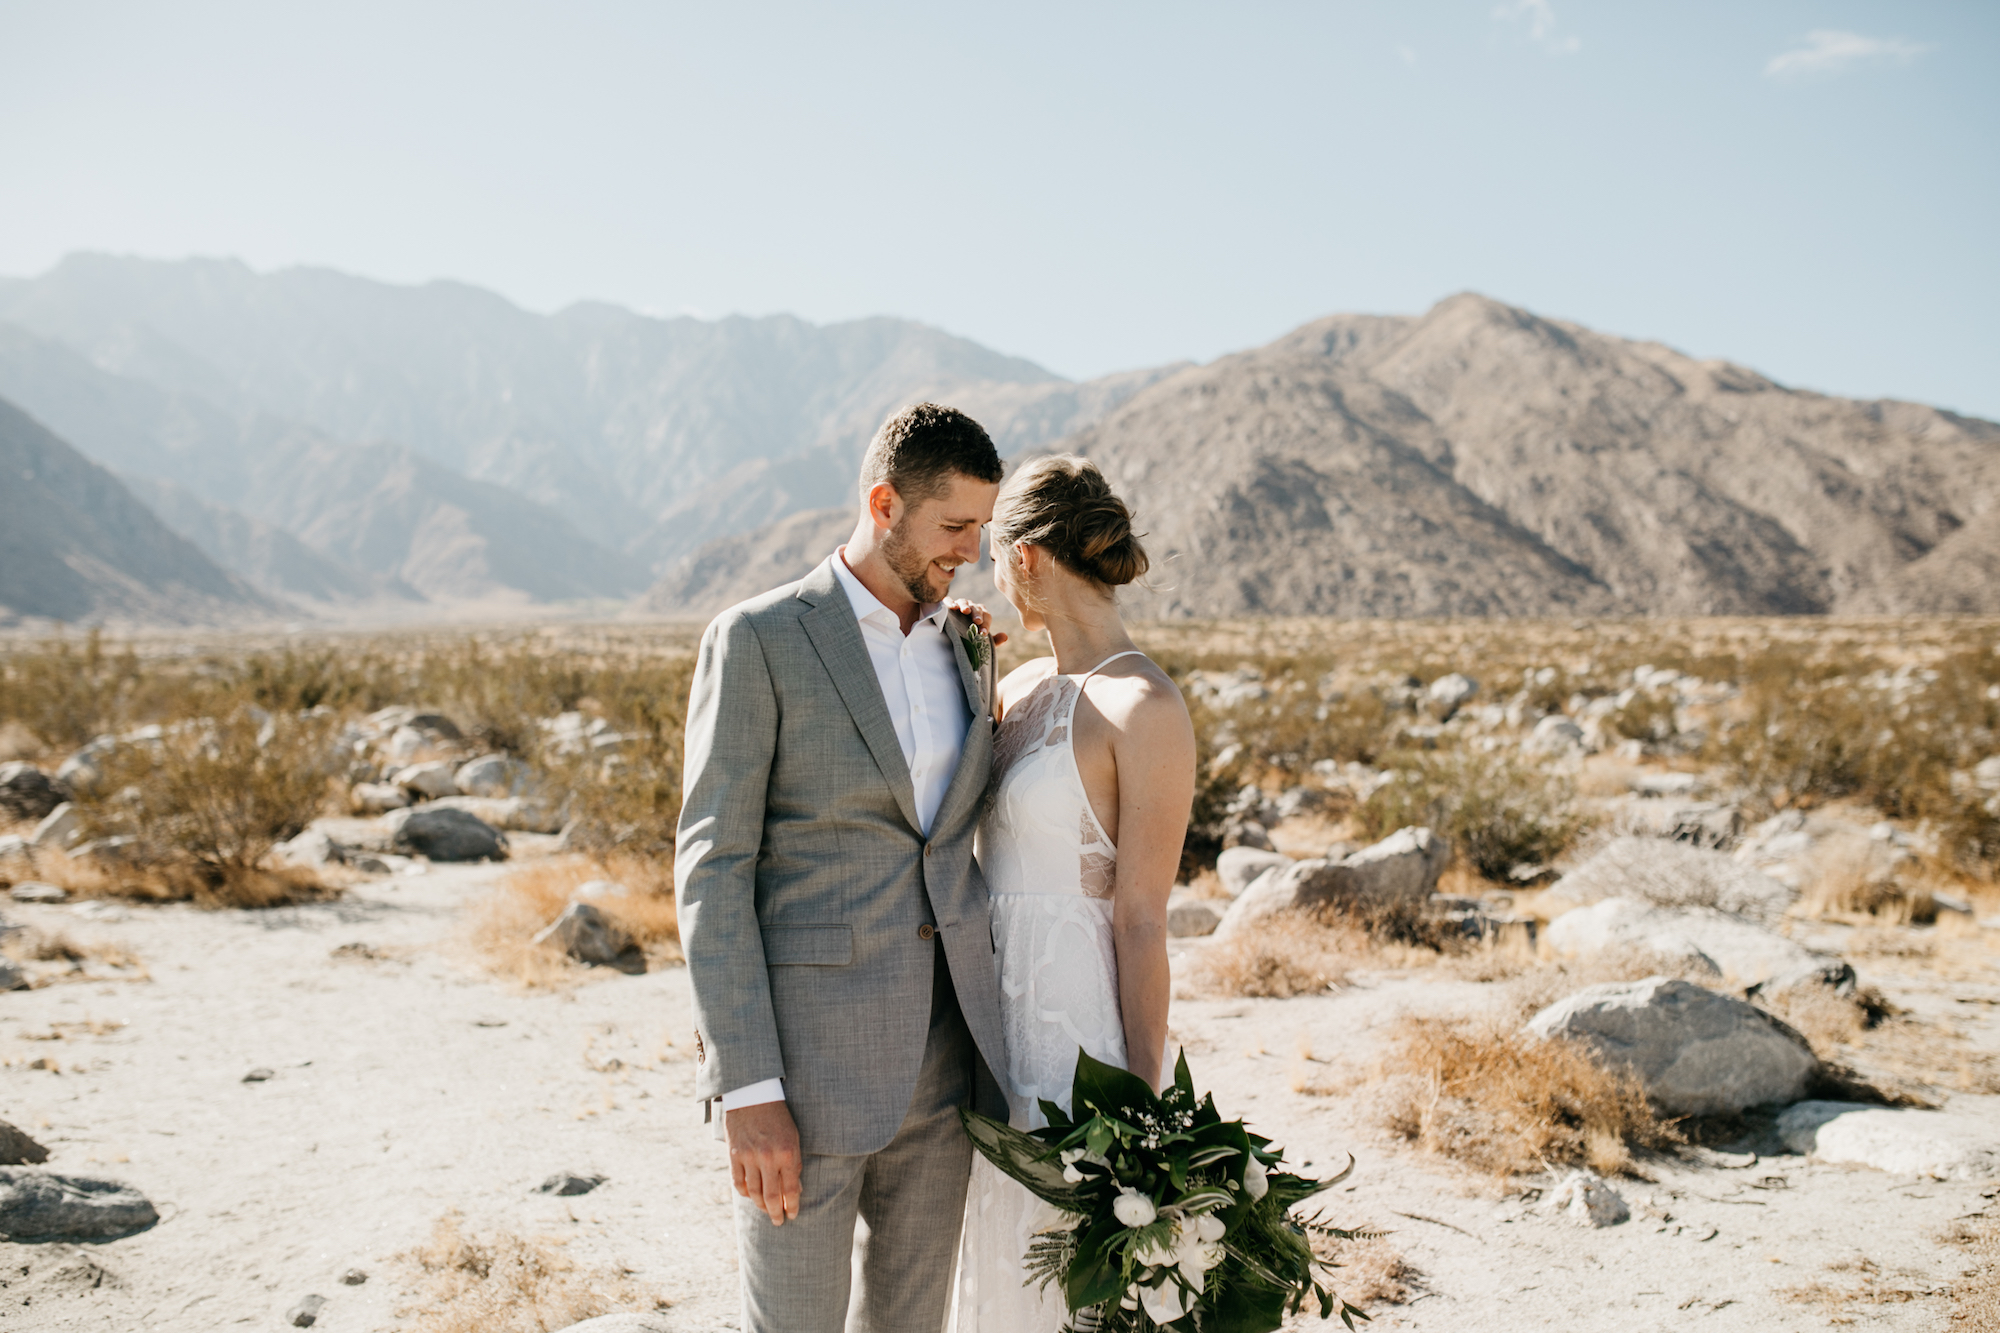 ace-hotel-palm-springs-wedding-photographer221.jpg